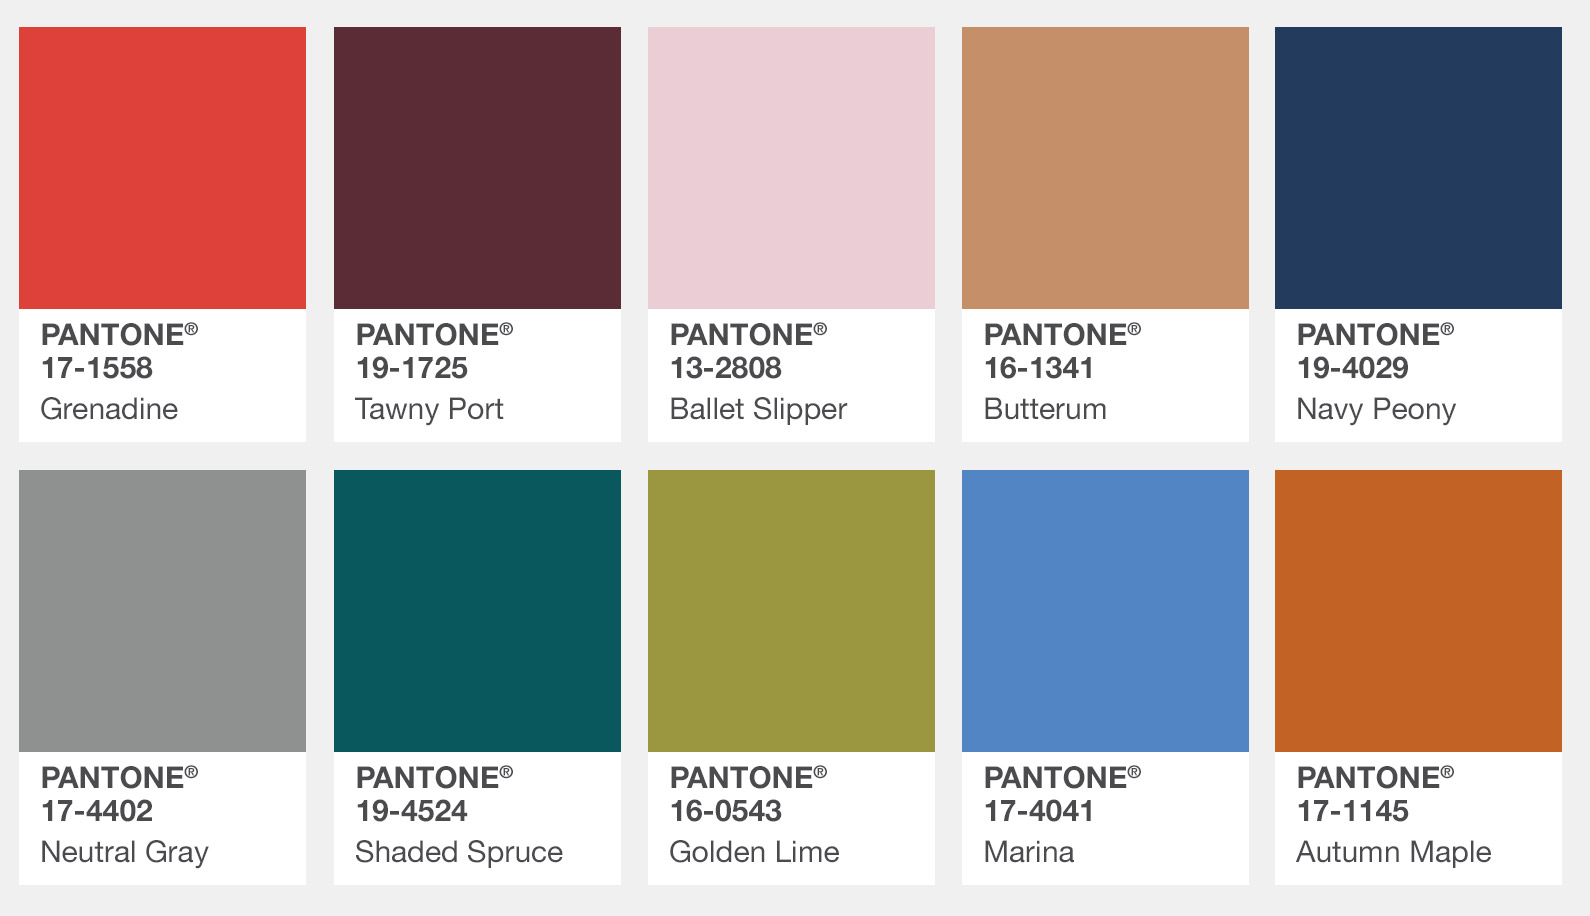 Pantone Fall 2017 Colour Trend Report